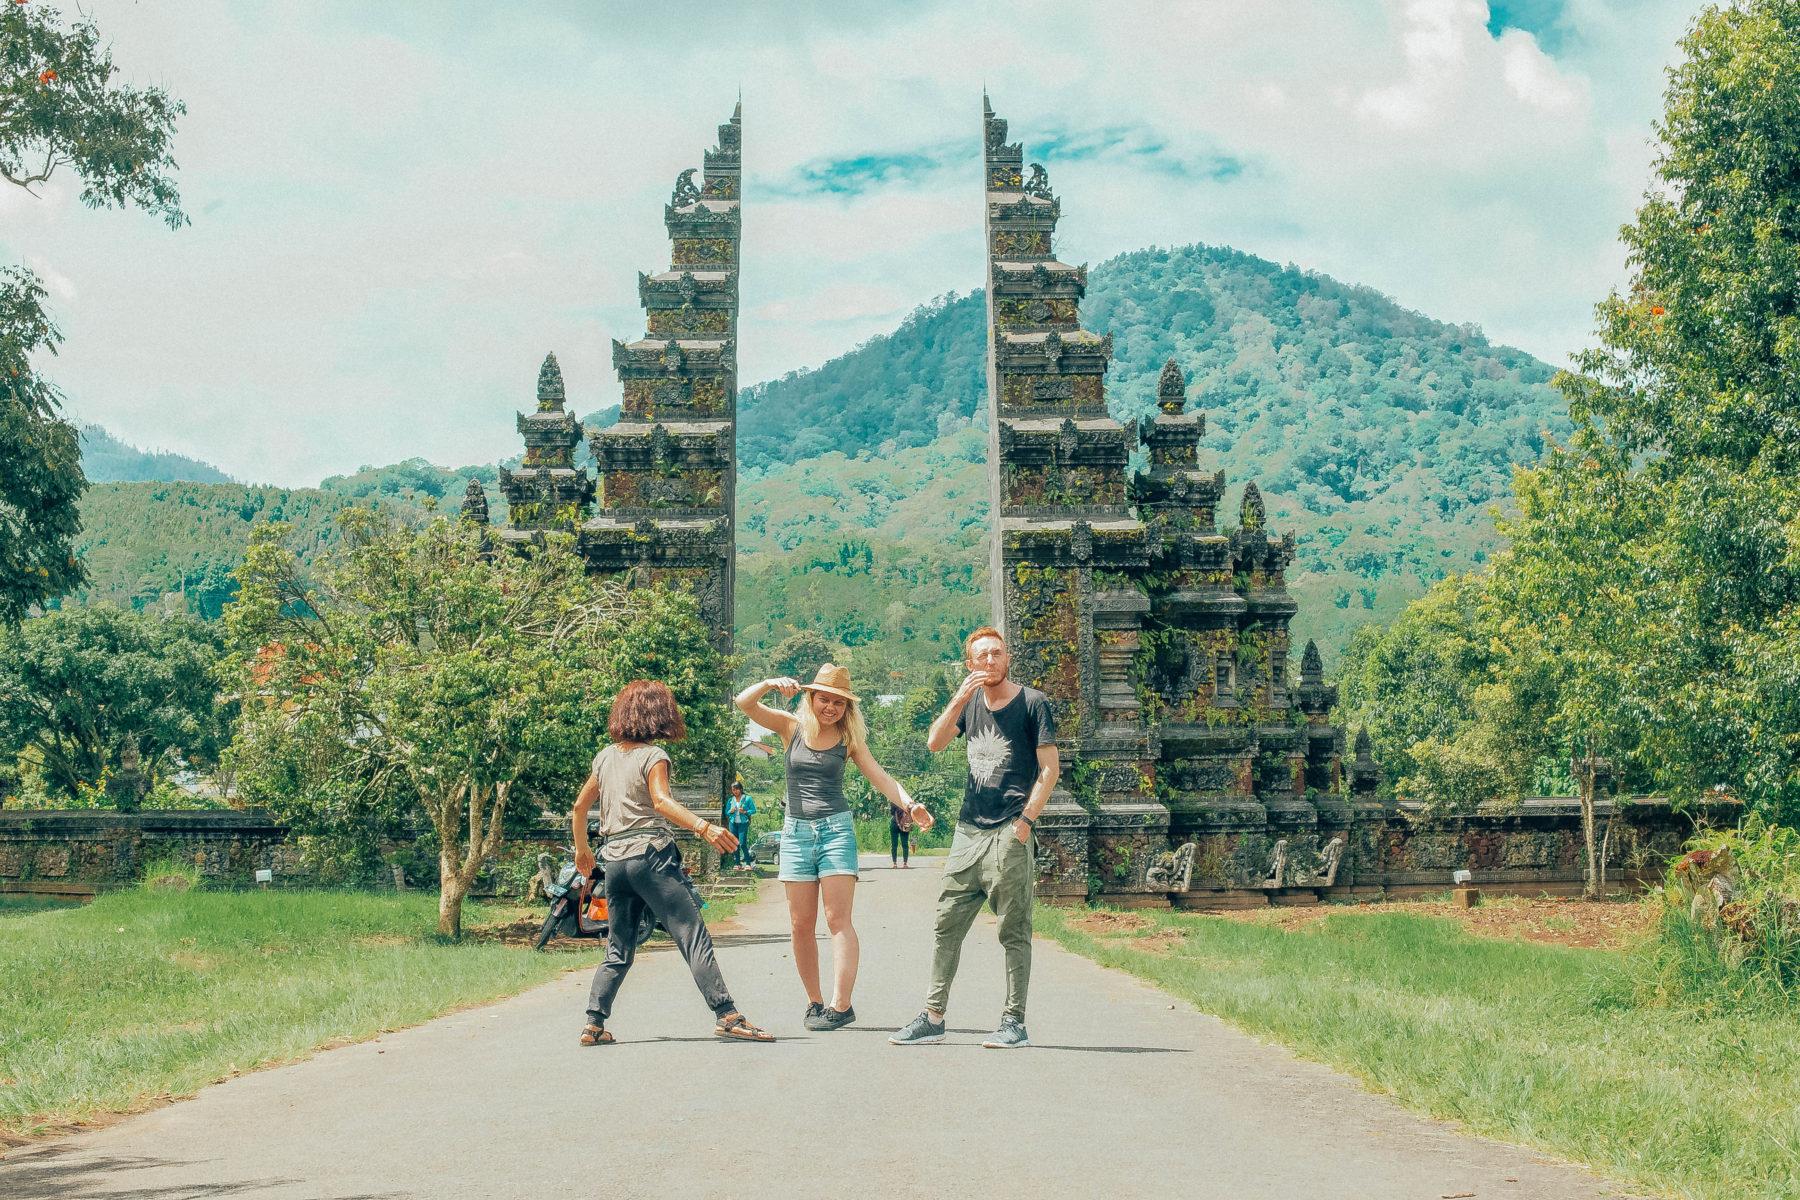 bali indonesia gate teple hindu famous spot friends having fun